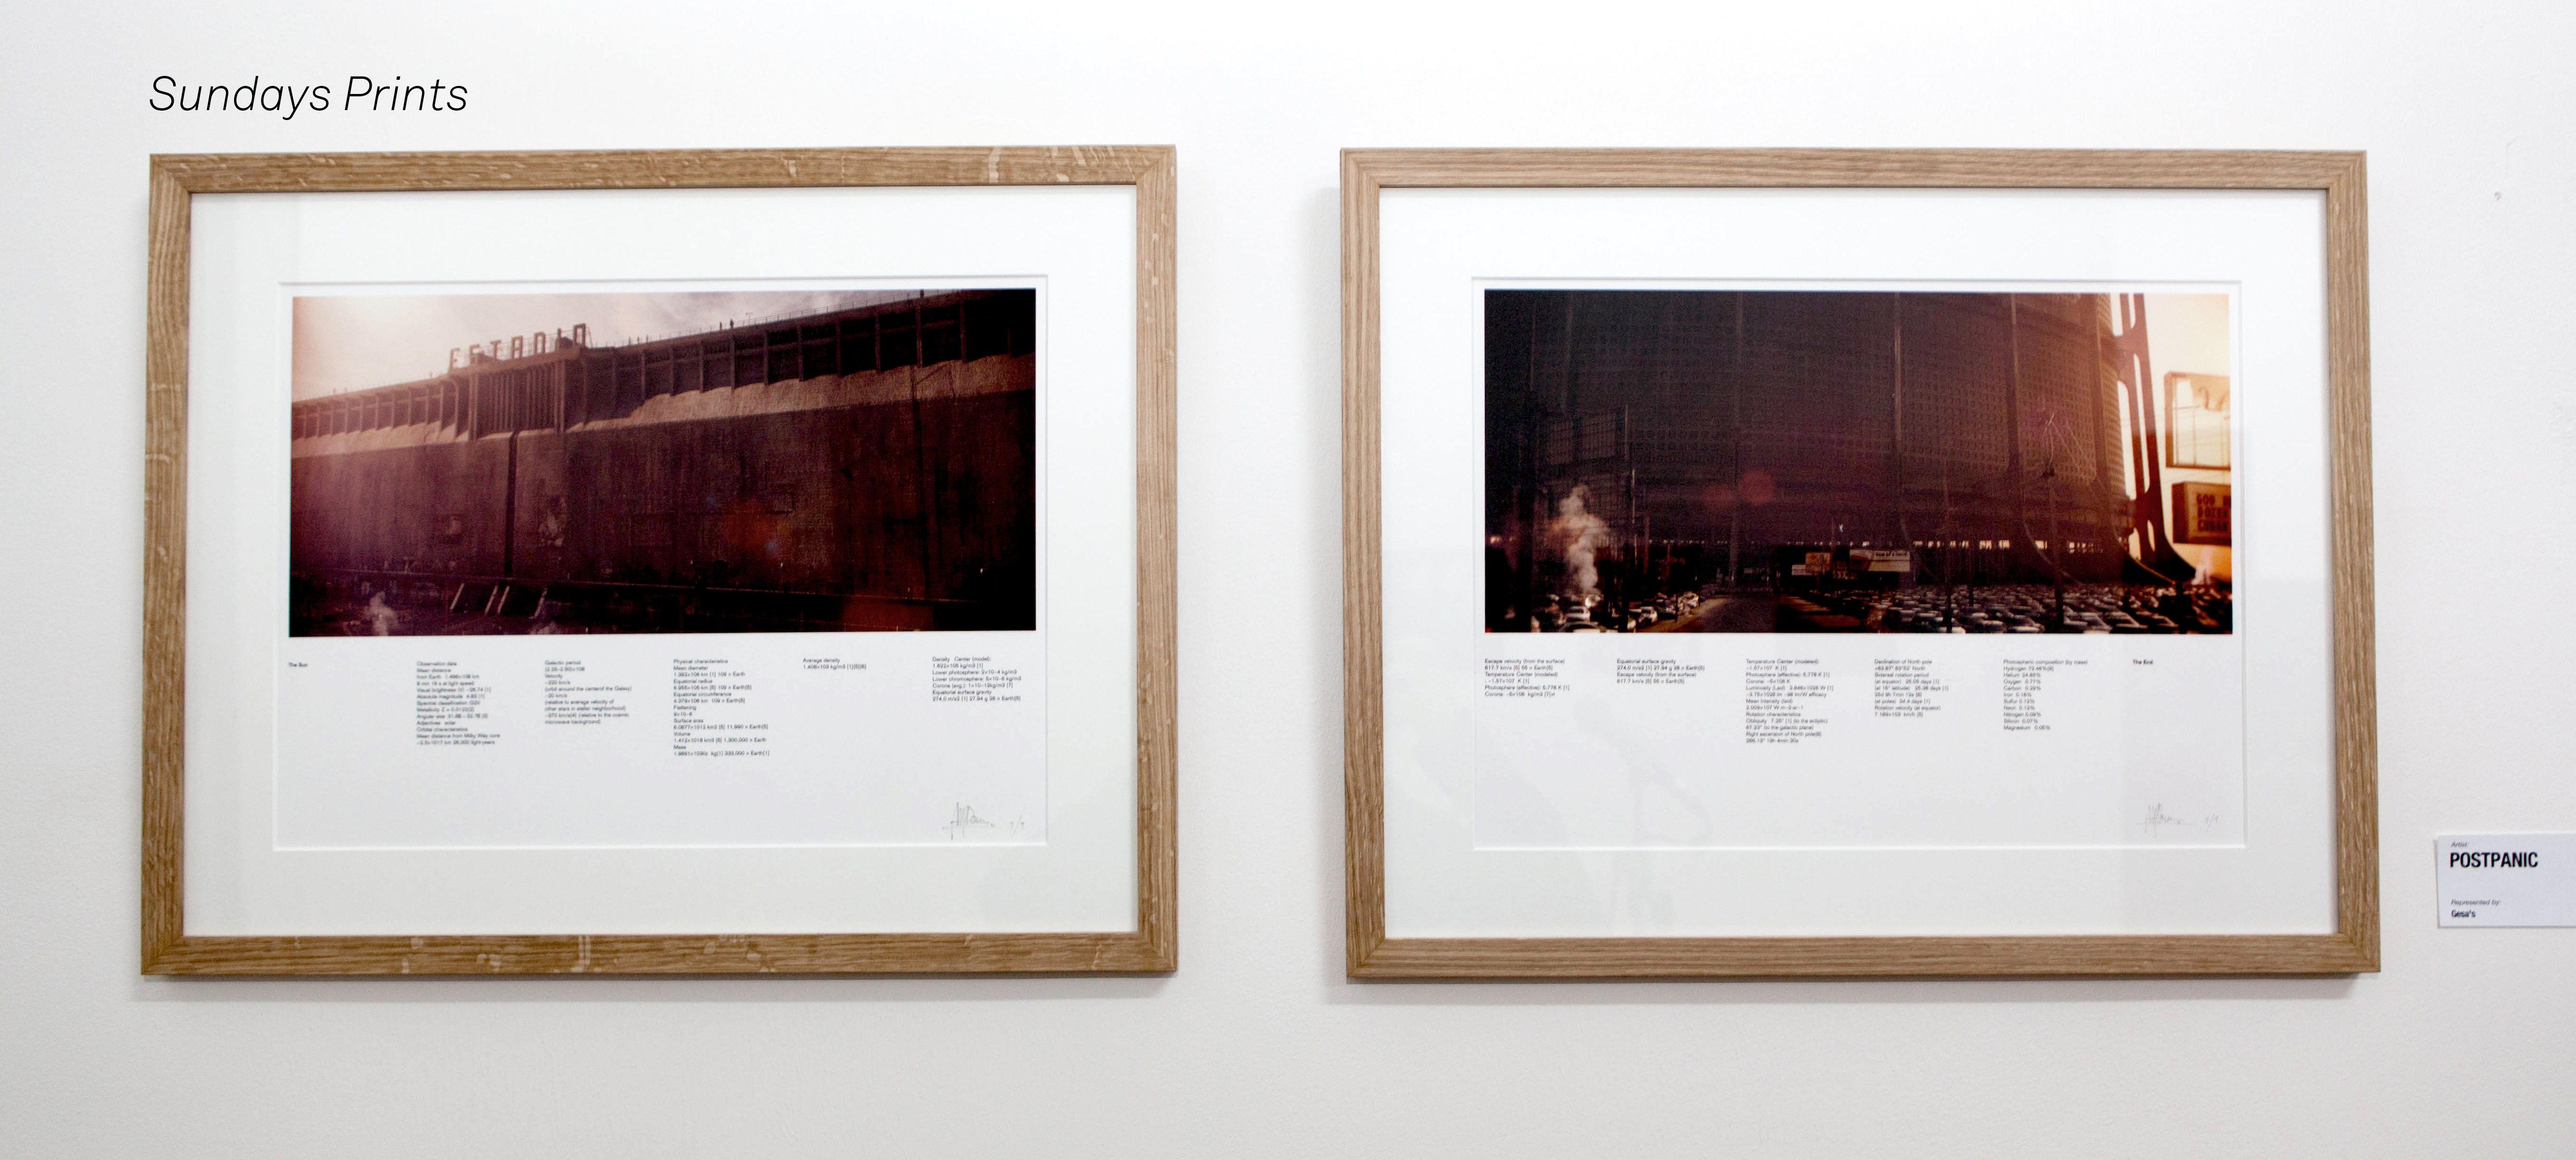 Sundays prints framed.